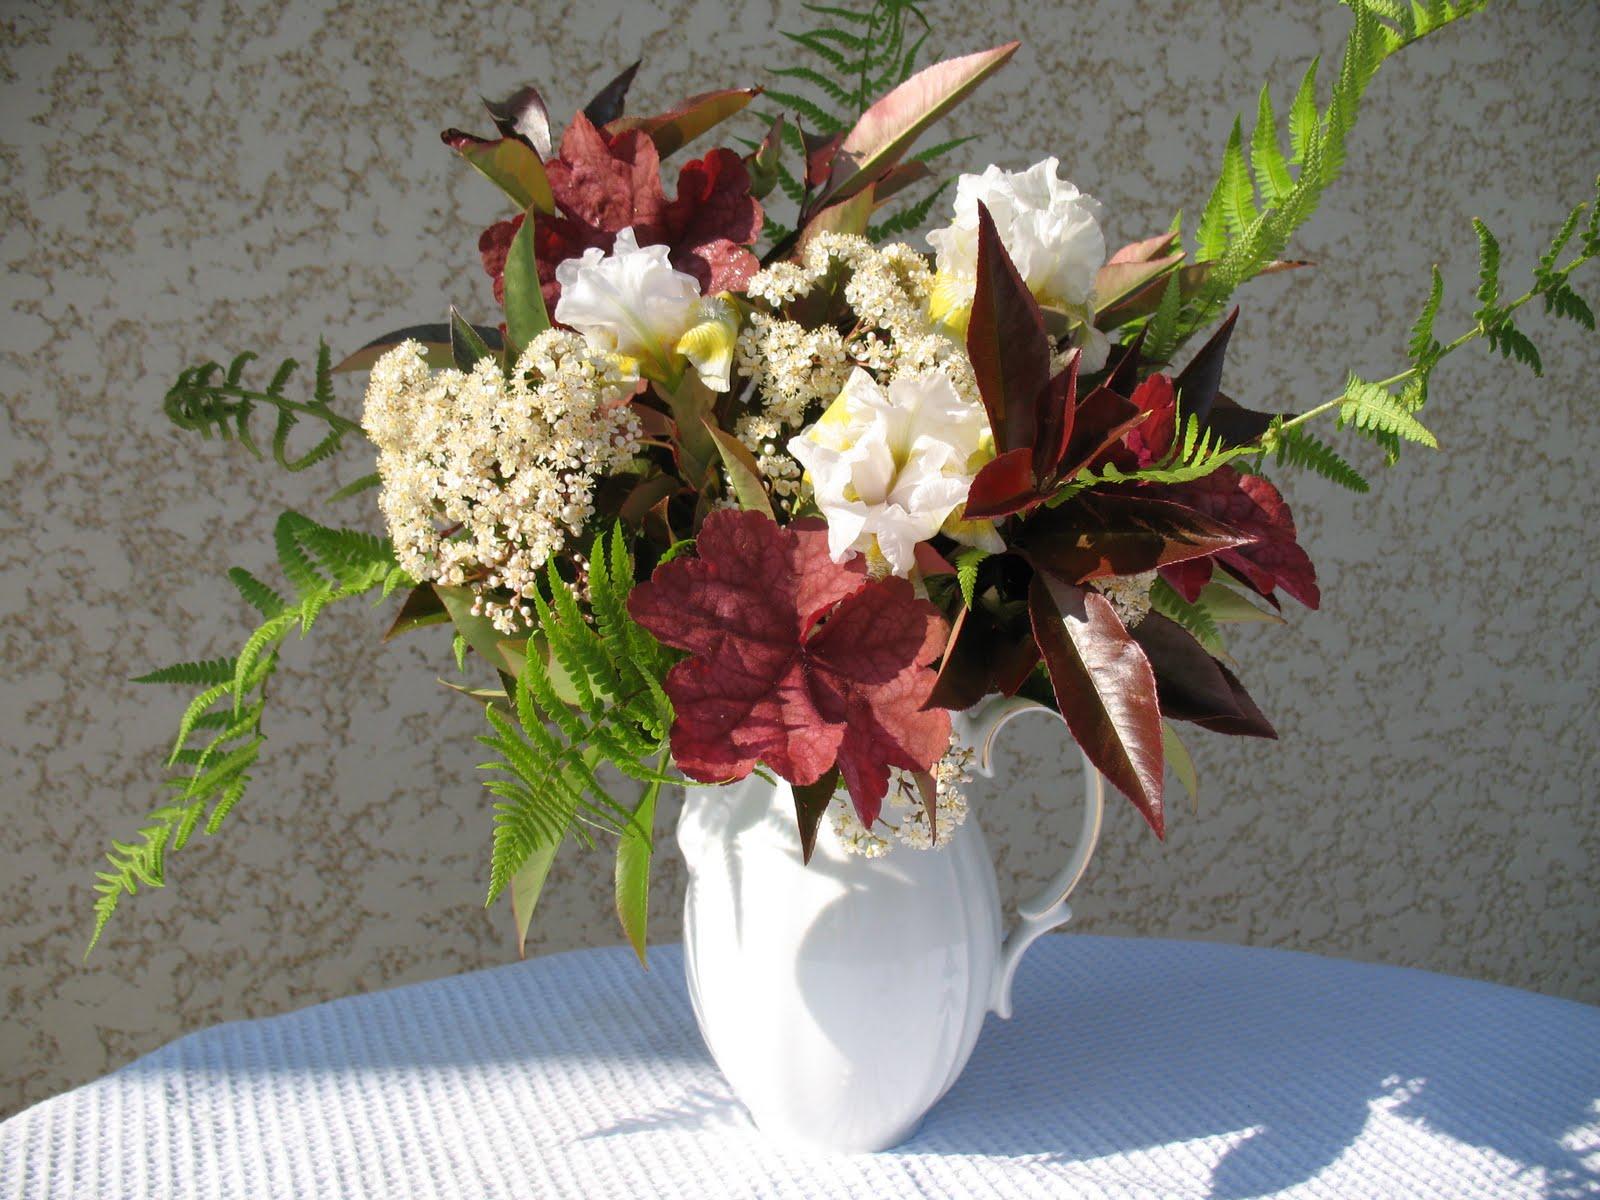 roses du jardin ch neland bouquet photinia iris et feuillage. Black Bedroom Furniture Sets. Home Design Ideas